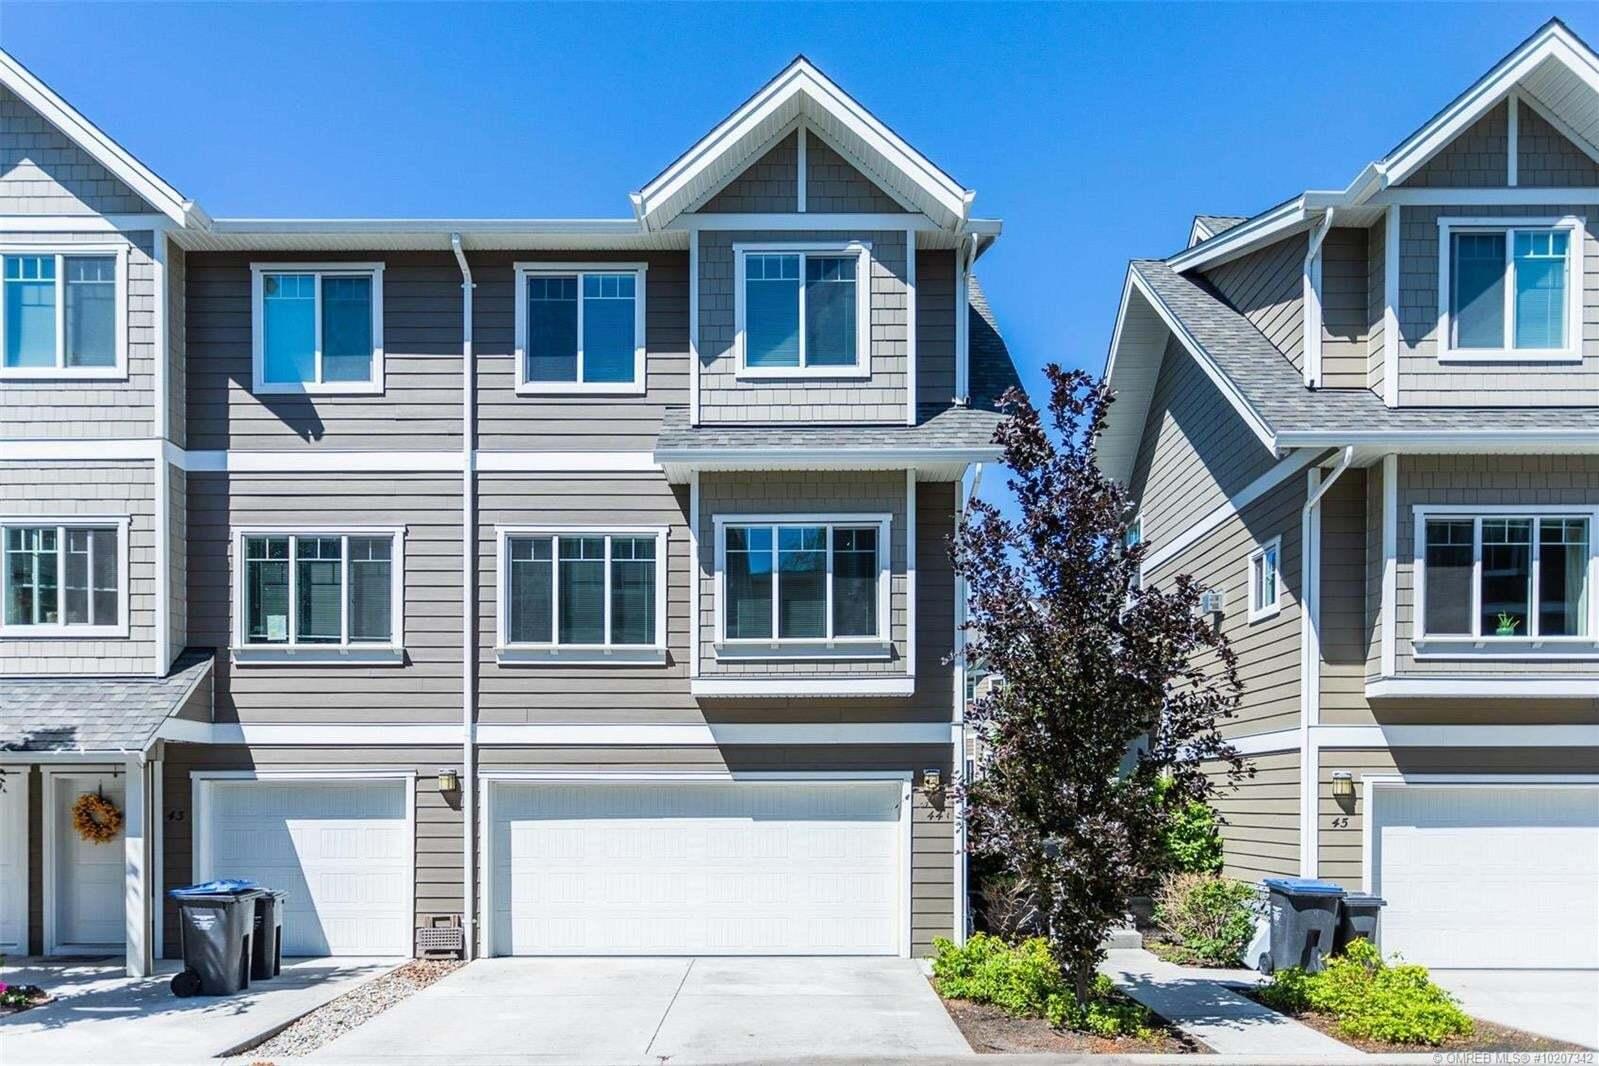 Townhouse for sale at 600 Sherwood Rd Kelowna British Columbia - MLS: 10207342